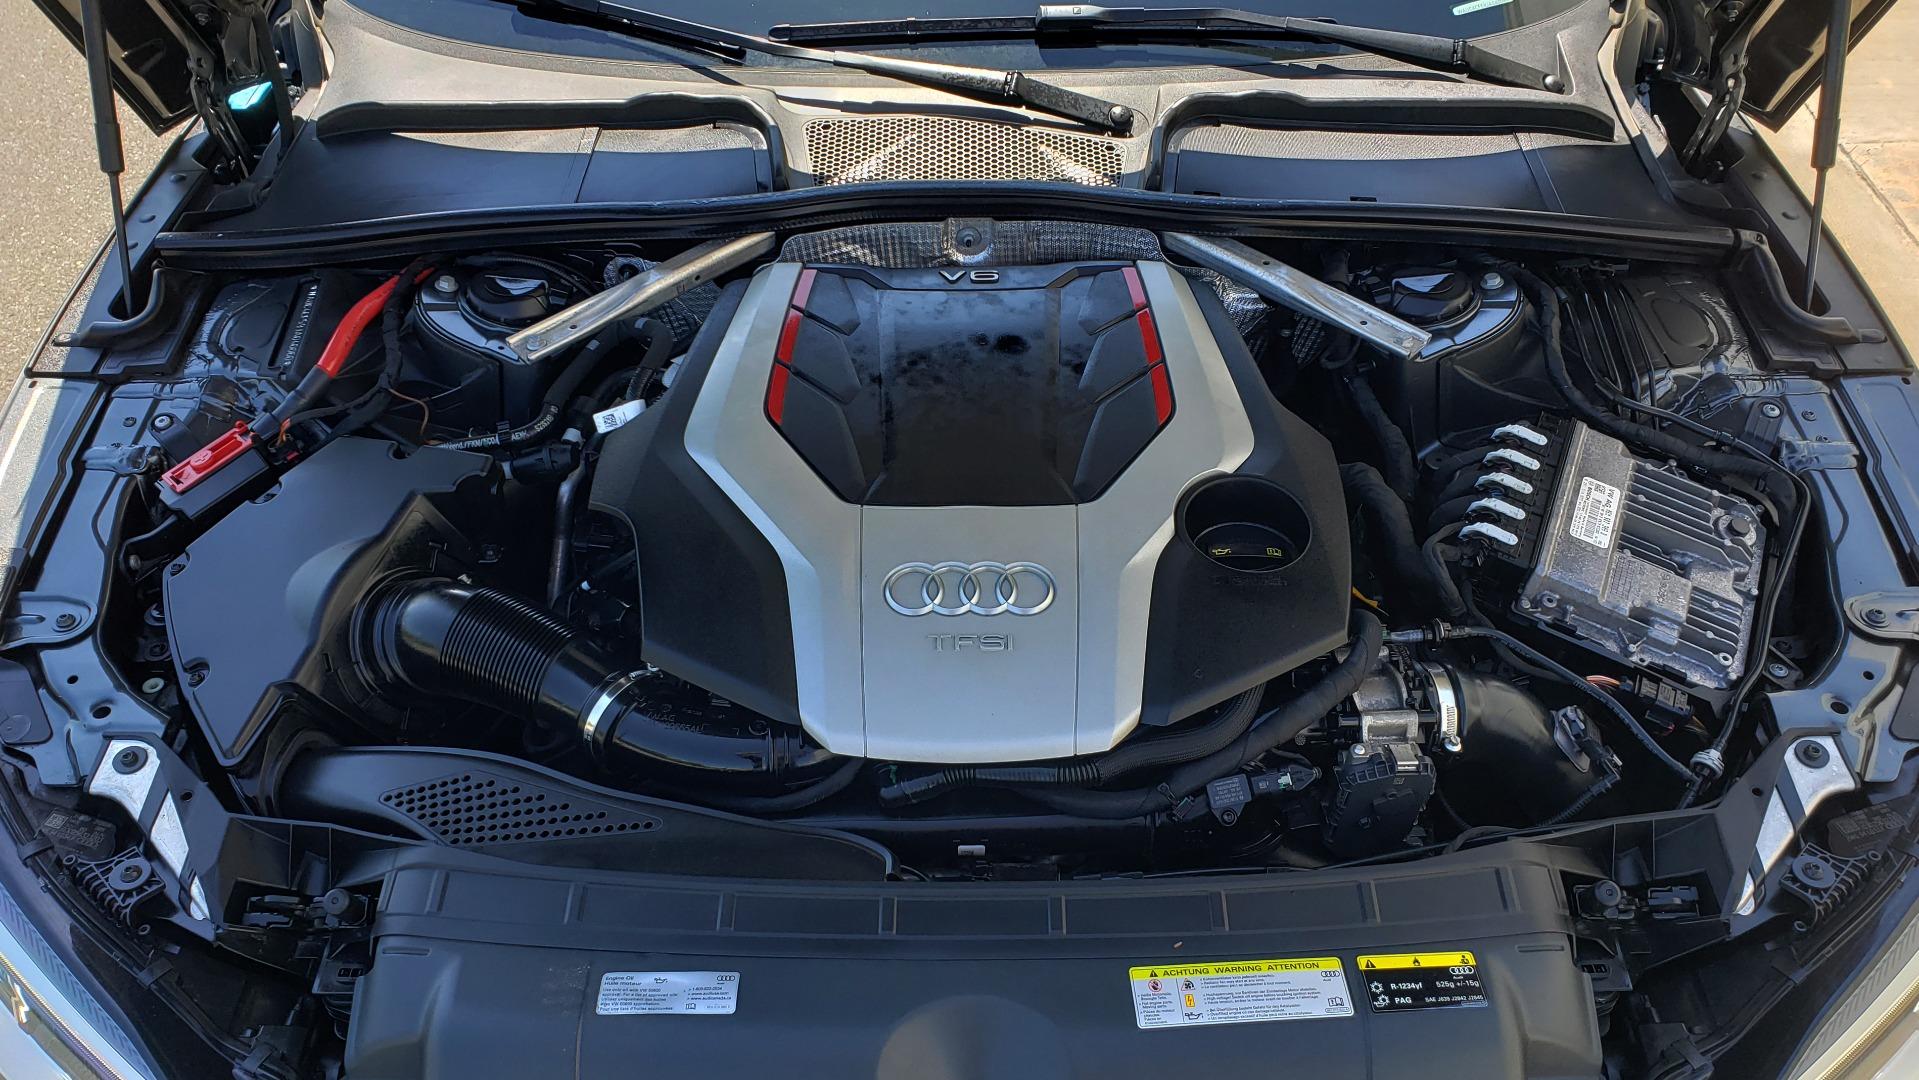 Used 2018 Audi S5 SPORTBACK PRESTIGE S-SPORT / NAV / SUNROOF / HUD / B&O SND / REARVIEW for sale $48,995 at Formula Imports in Charlotte NC 28227 14